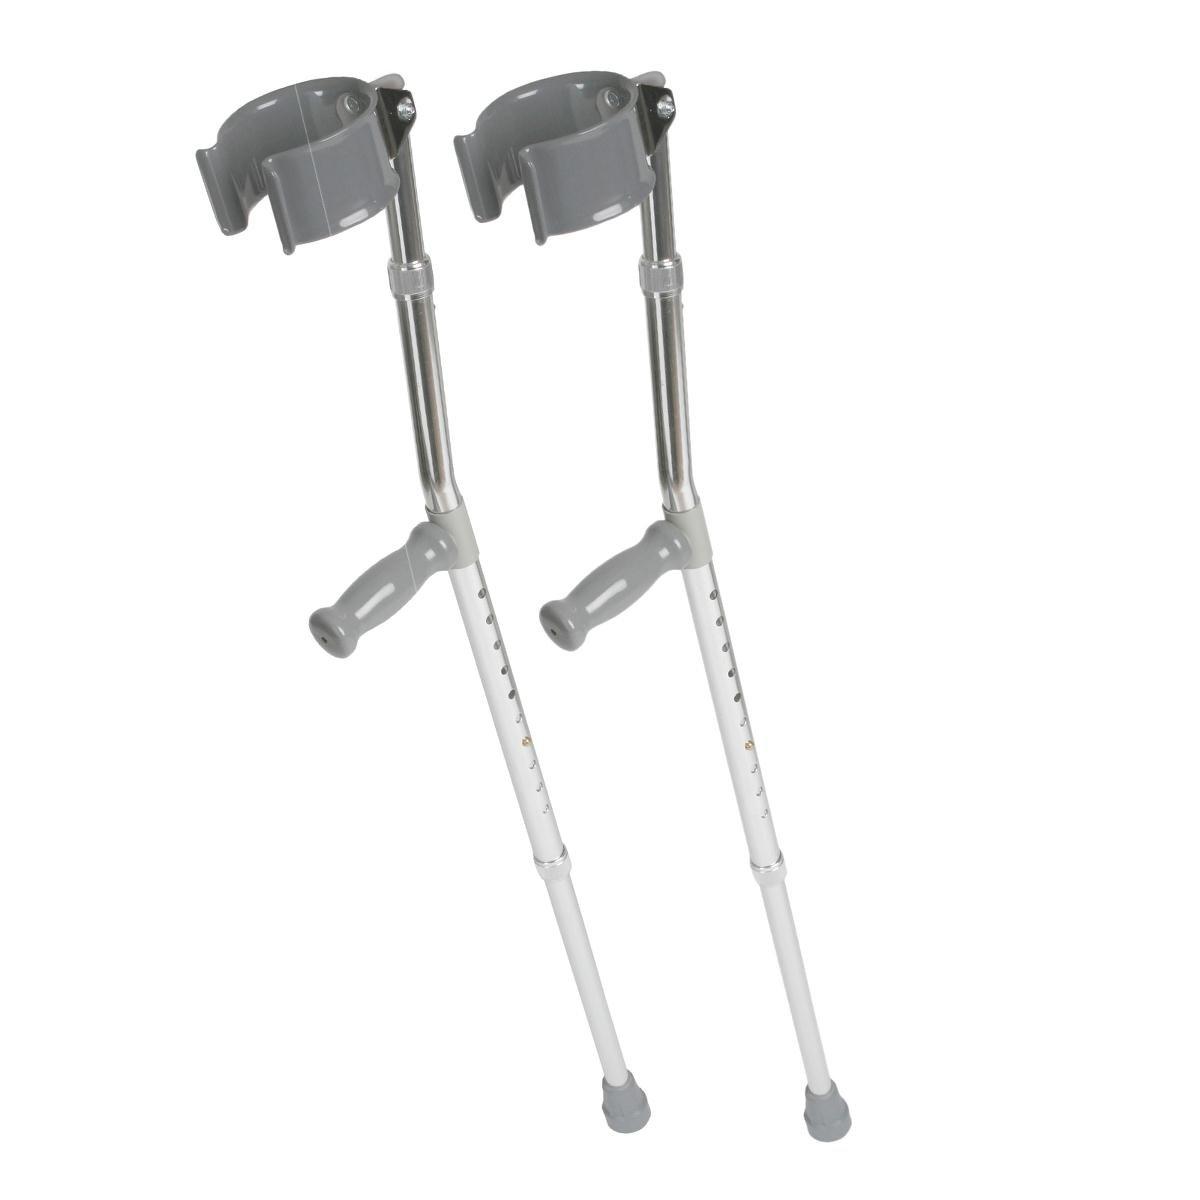 Medline MDS805160 Aluminum Forearm Crutches